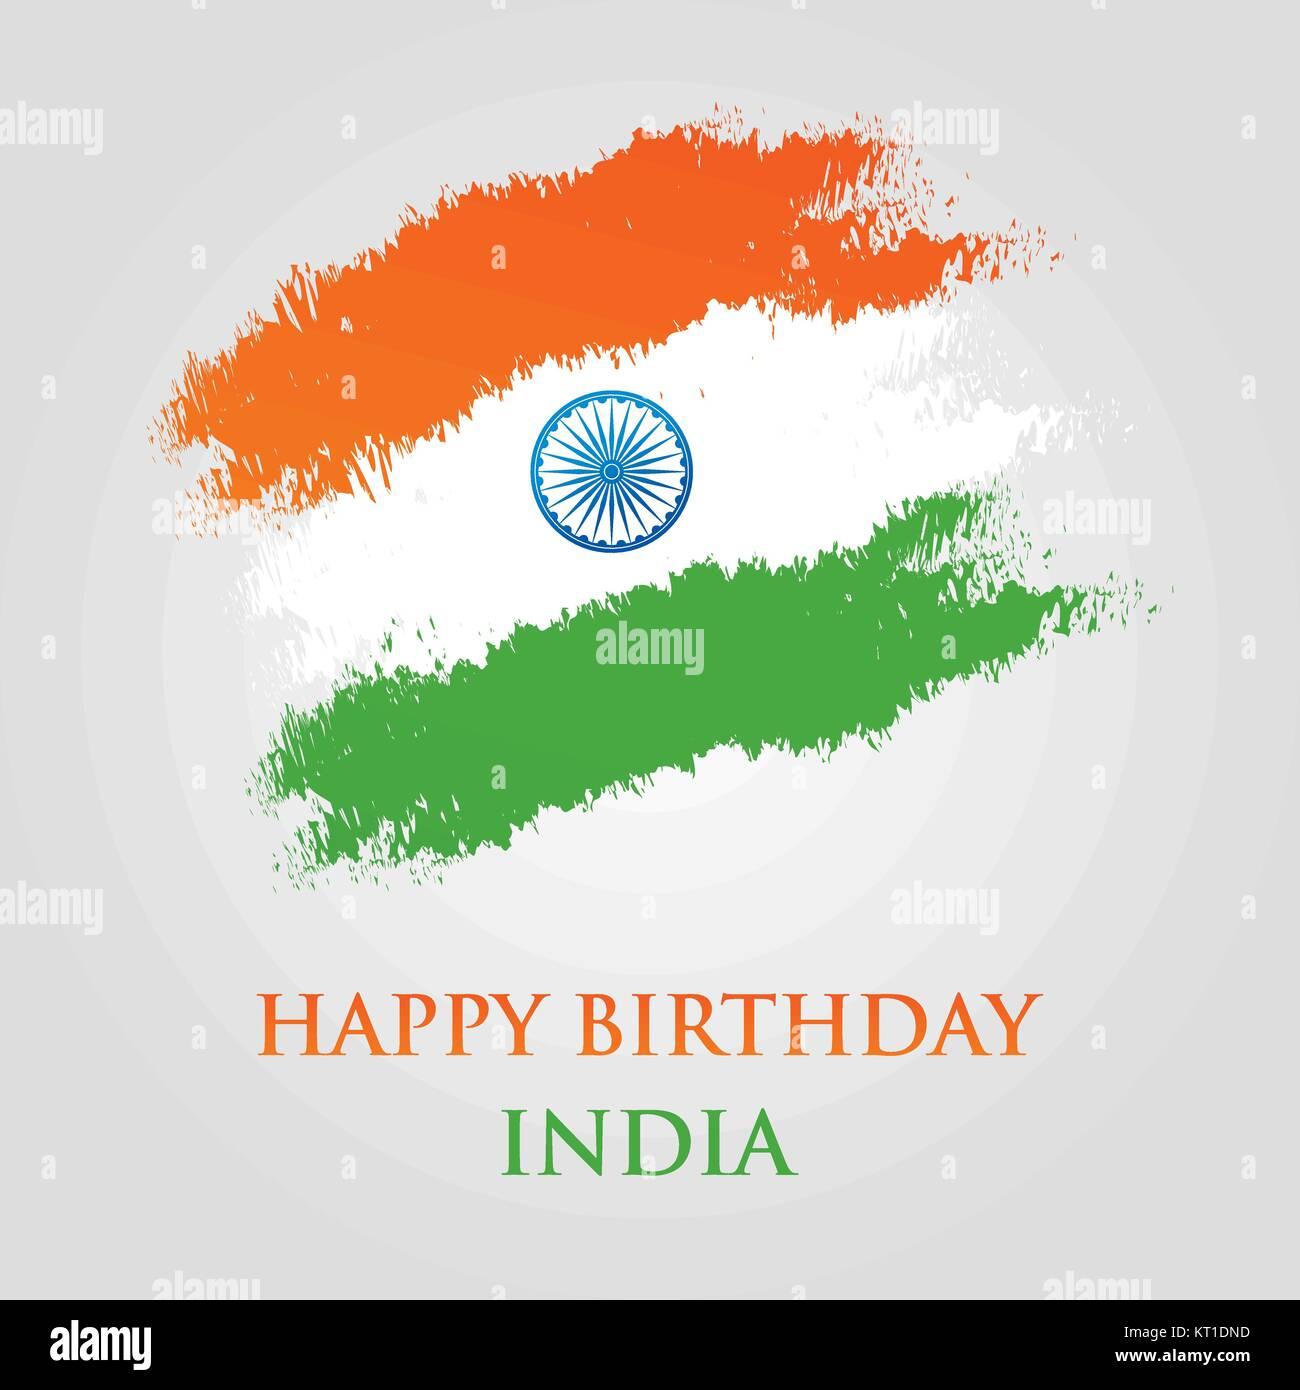 India republic day greeting card design vector illustration 26 india republic day greeting card design vector illustration 26 january republic day of india m4hsunfo